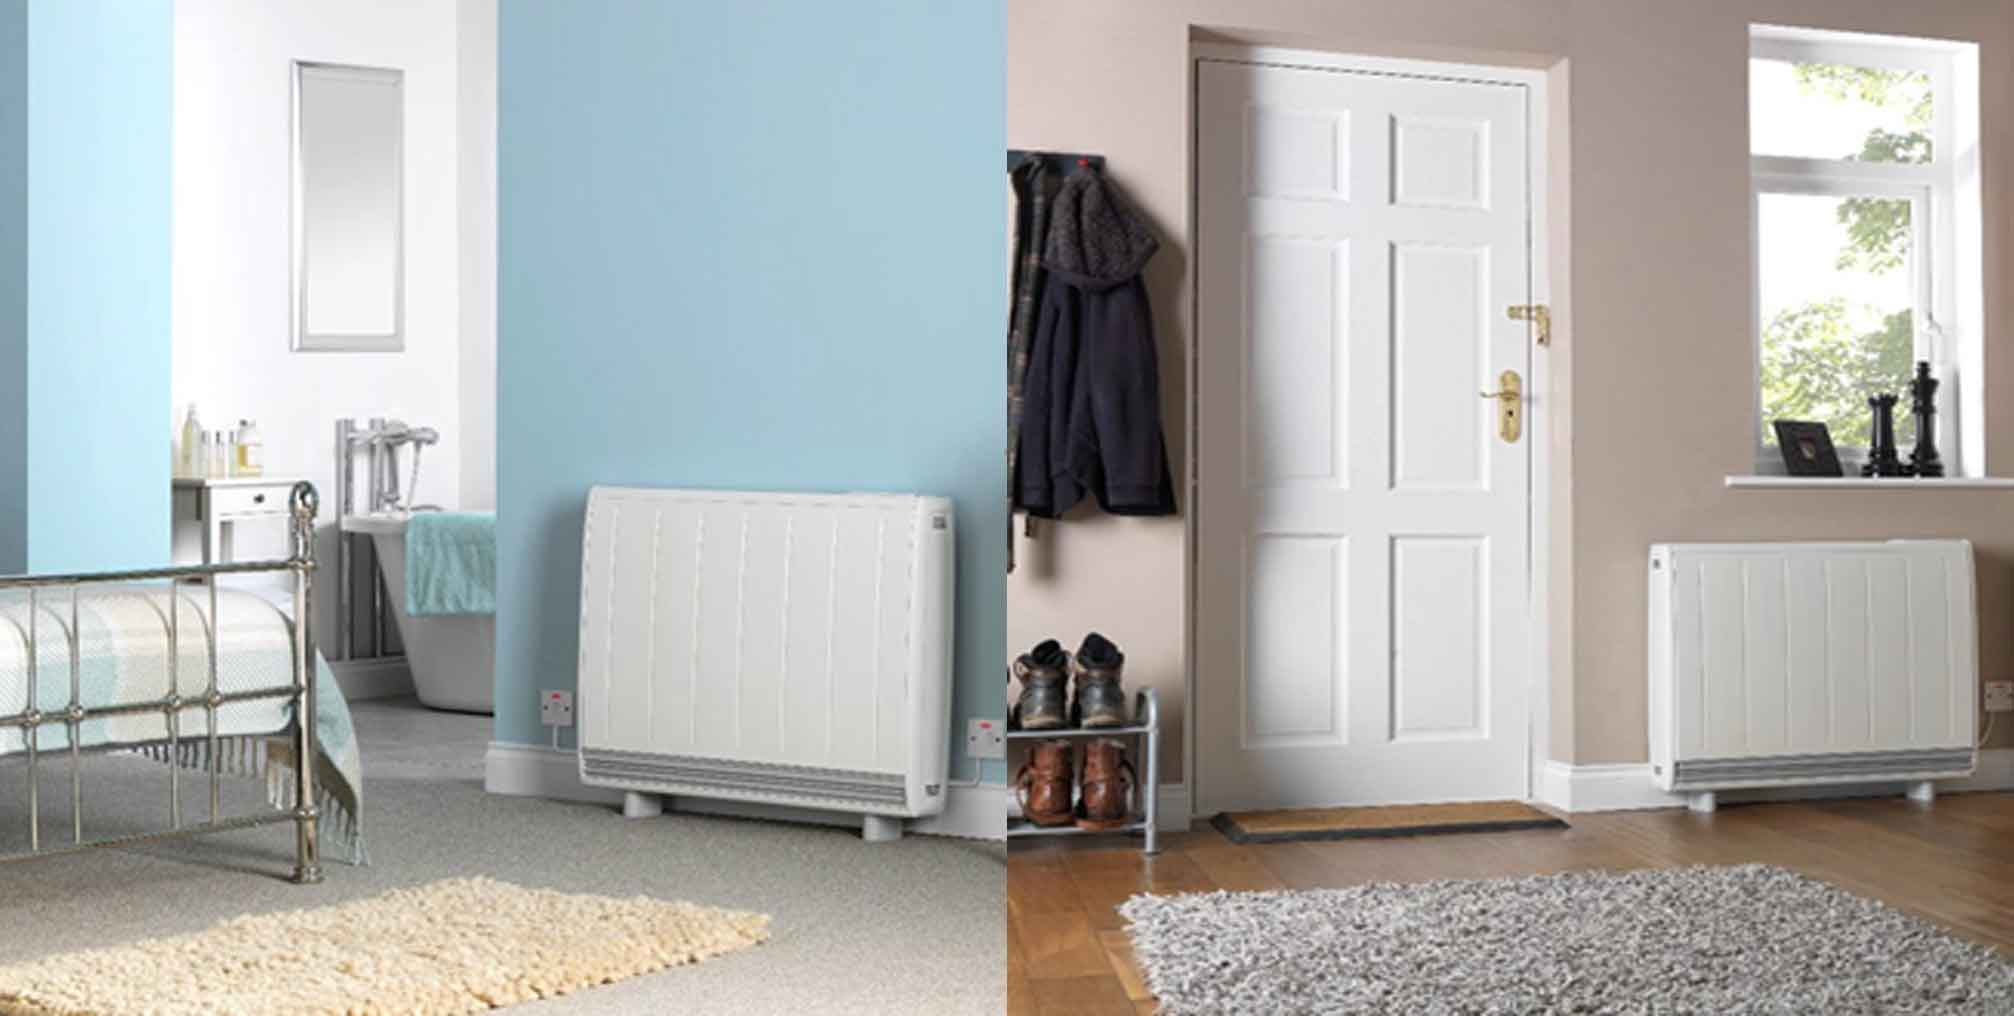 OVO and Glen Dimplex Heating & Ventilation 'Smart Heat' partnership